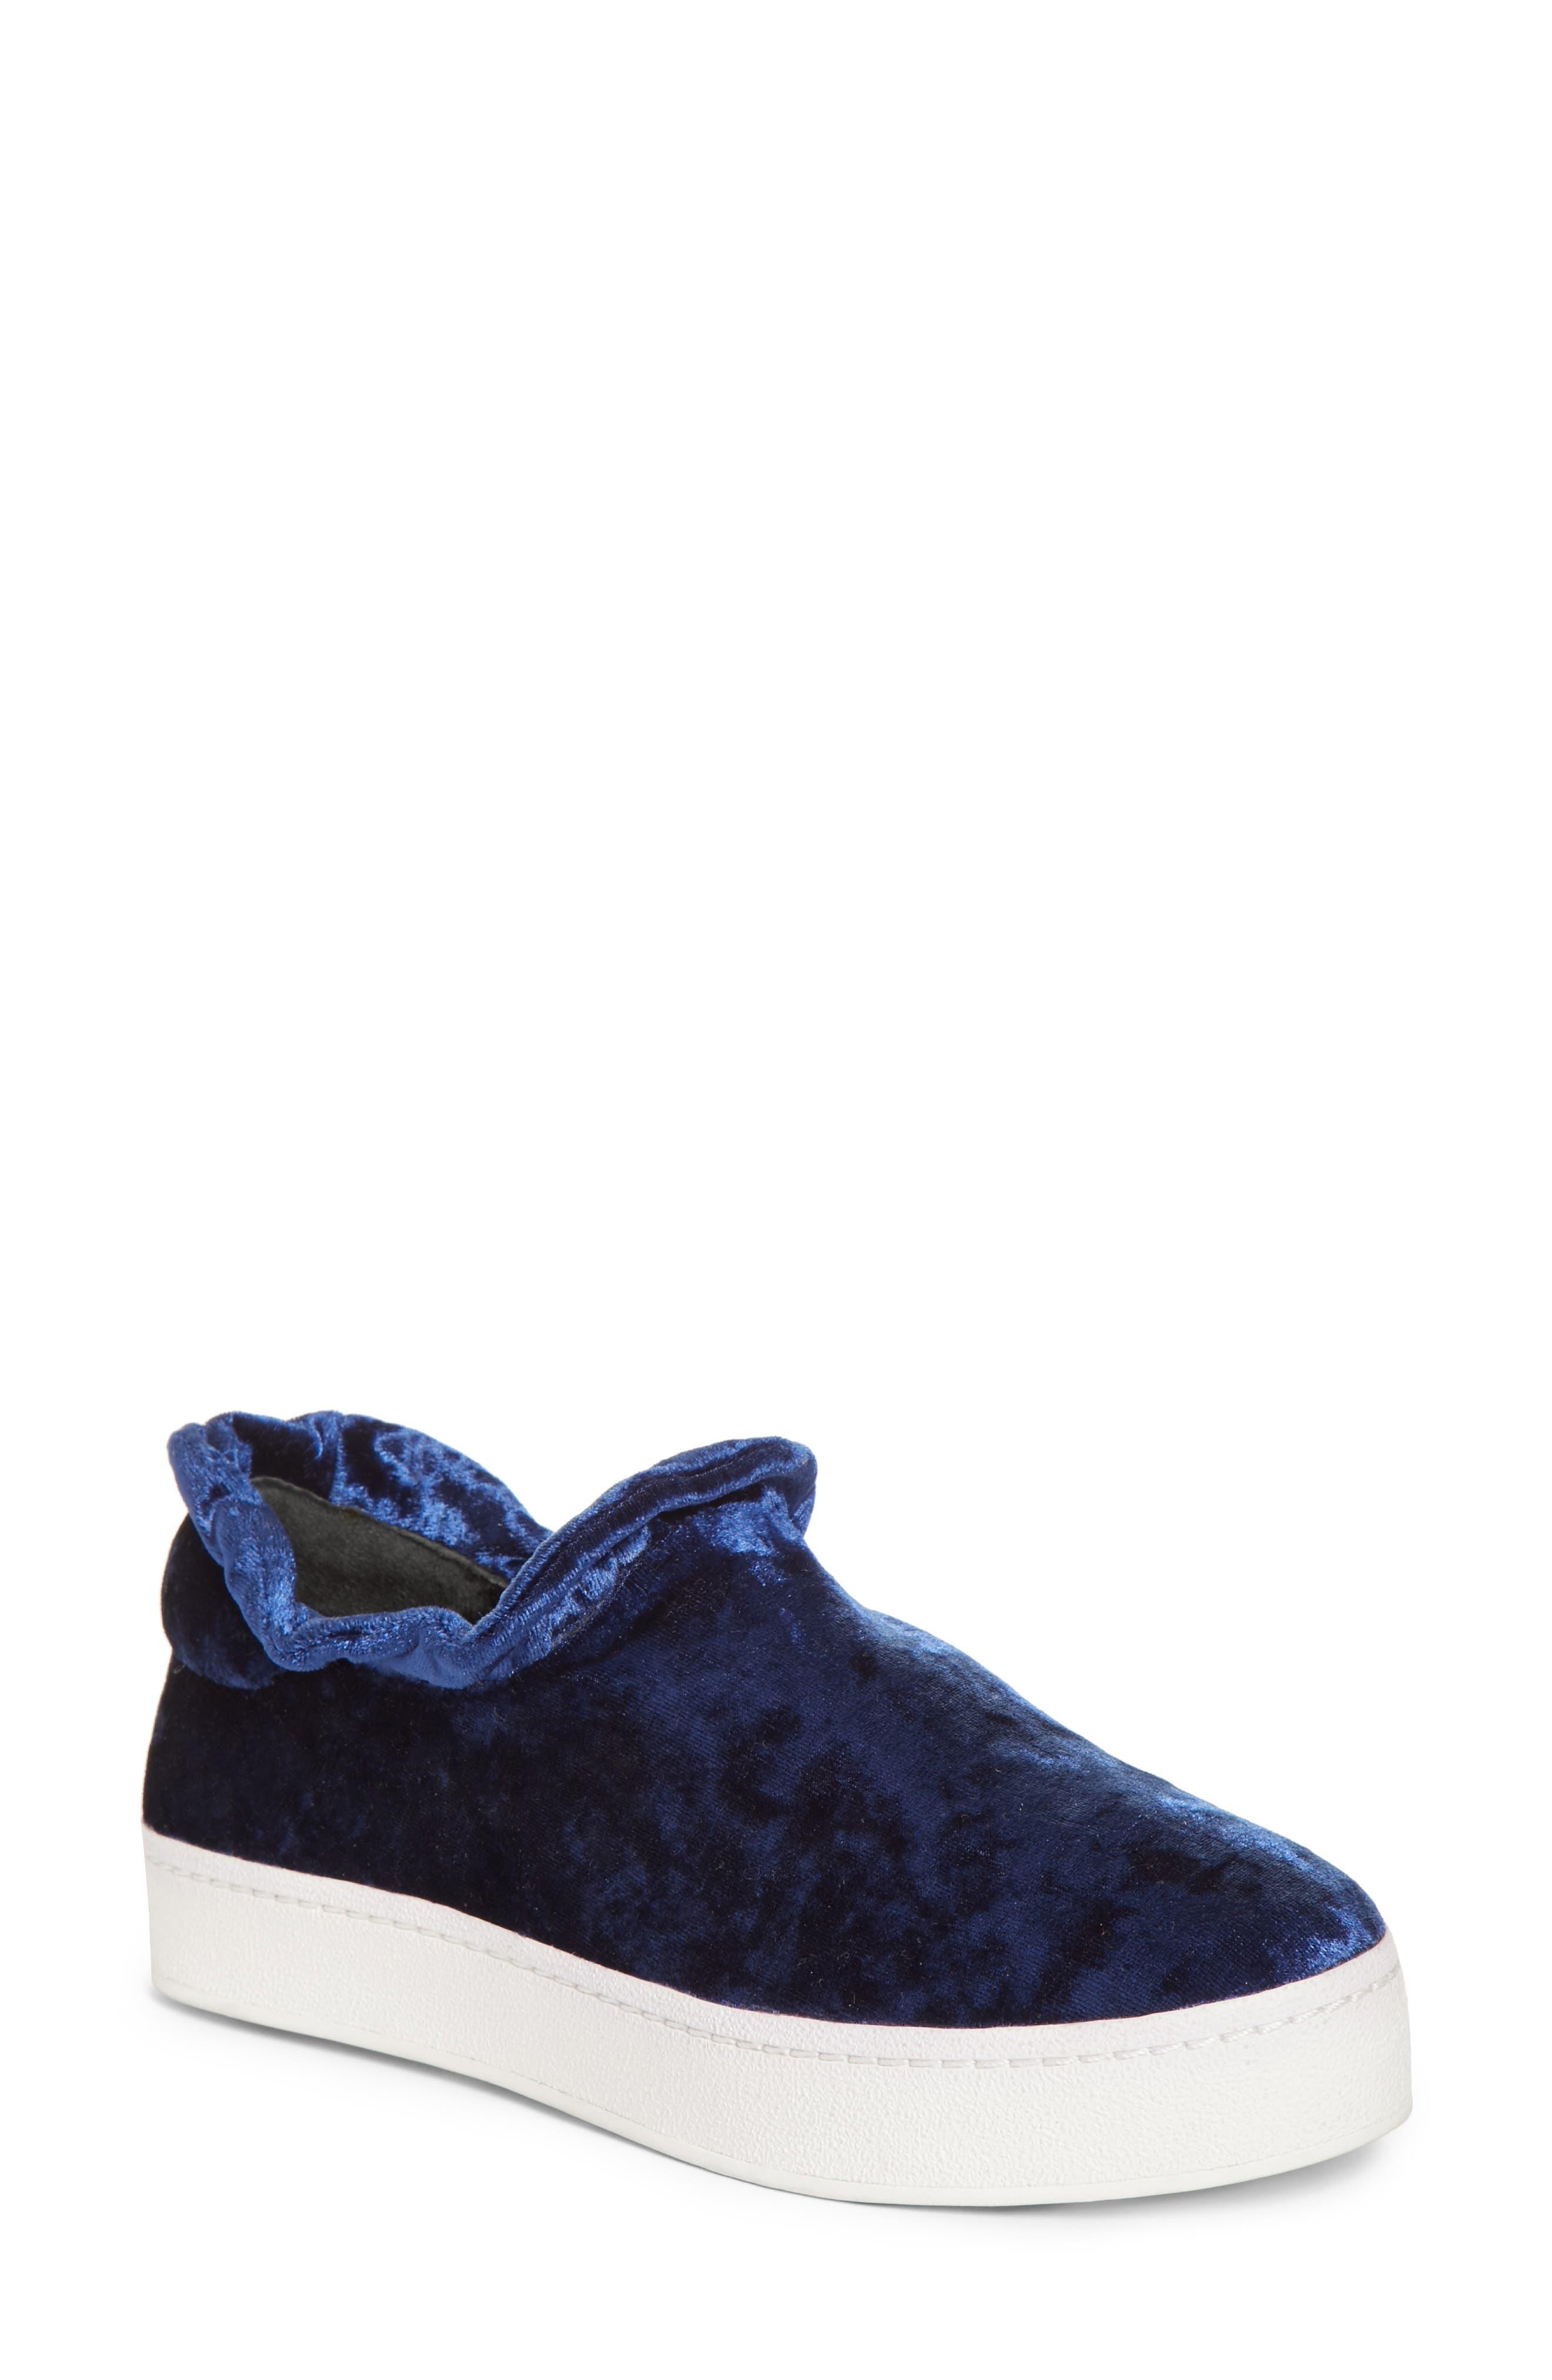 Cici Velvet Ruffle Slip-On Sneaker,                             Main thumbnail 1, color,                             Eclipse